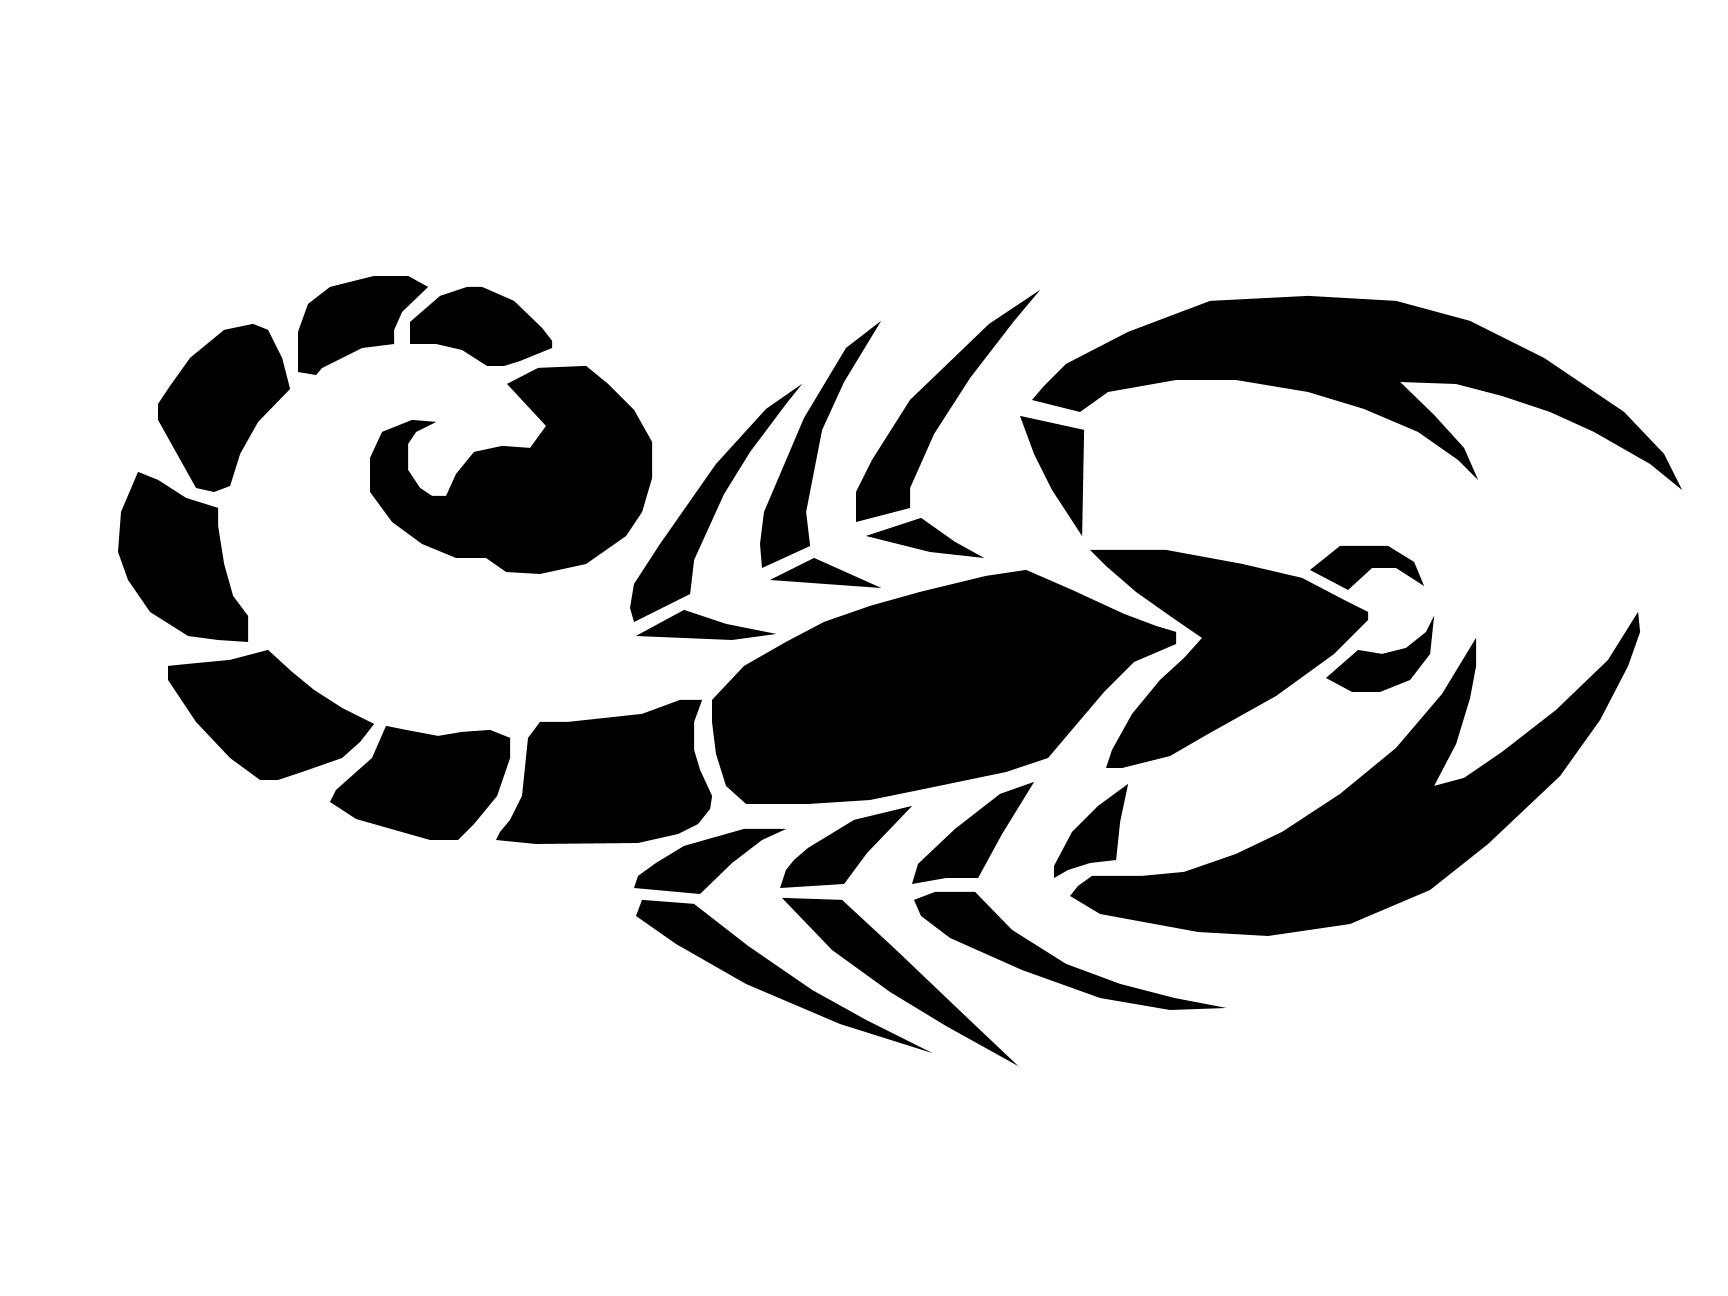 Scorpion HD PNG - 92786